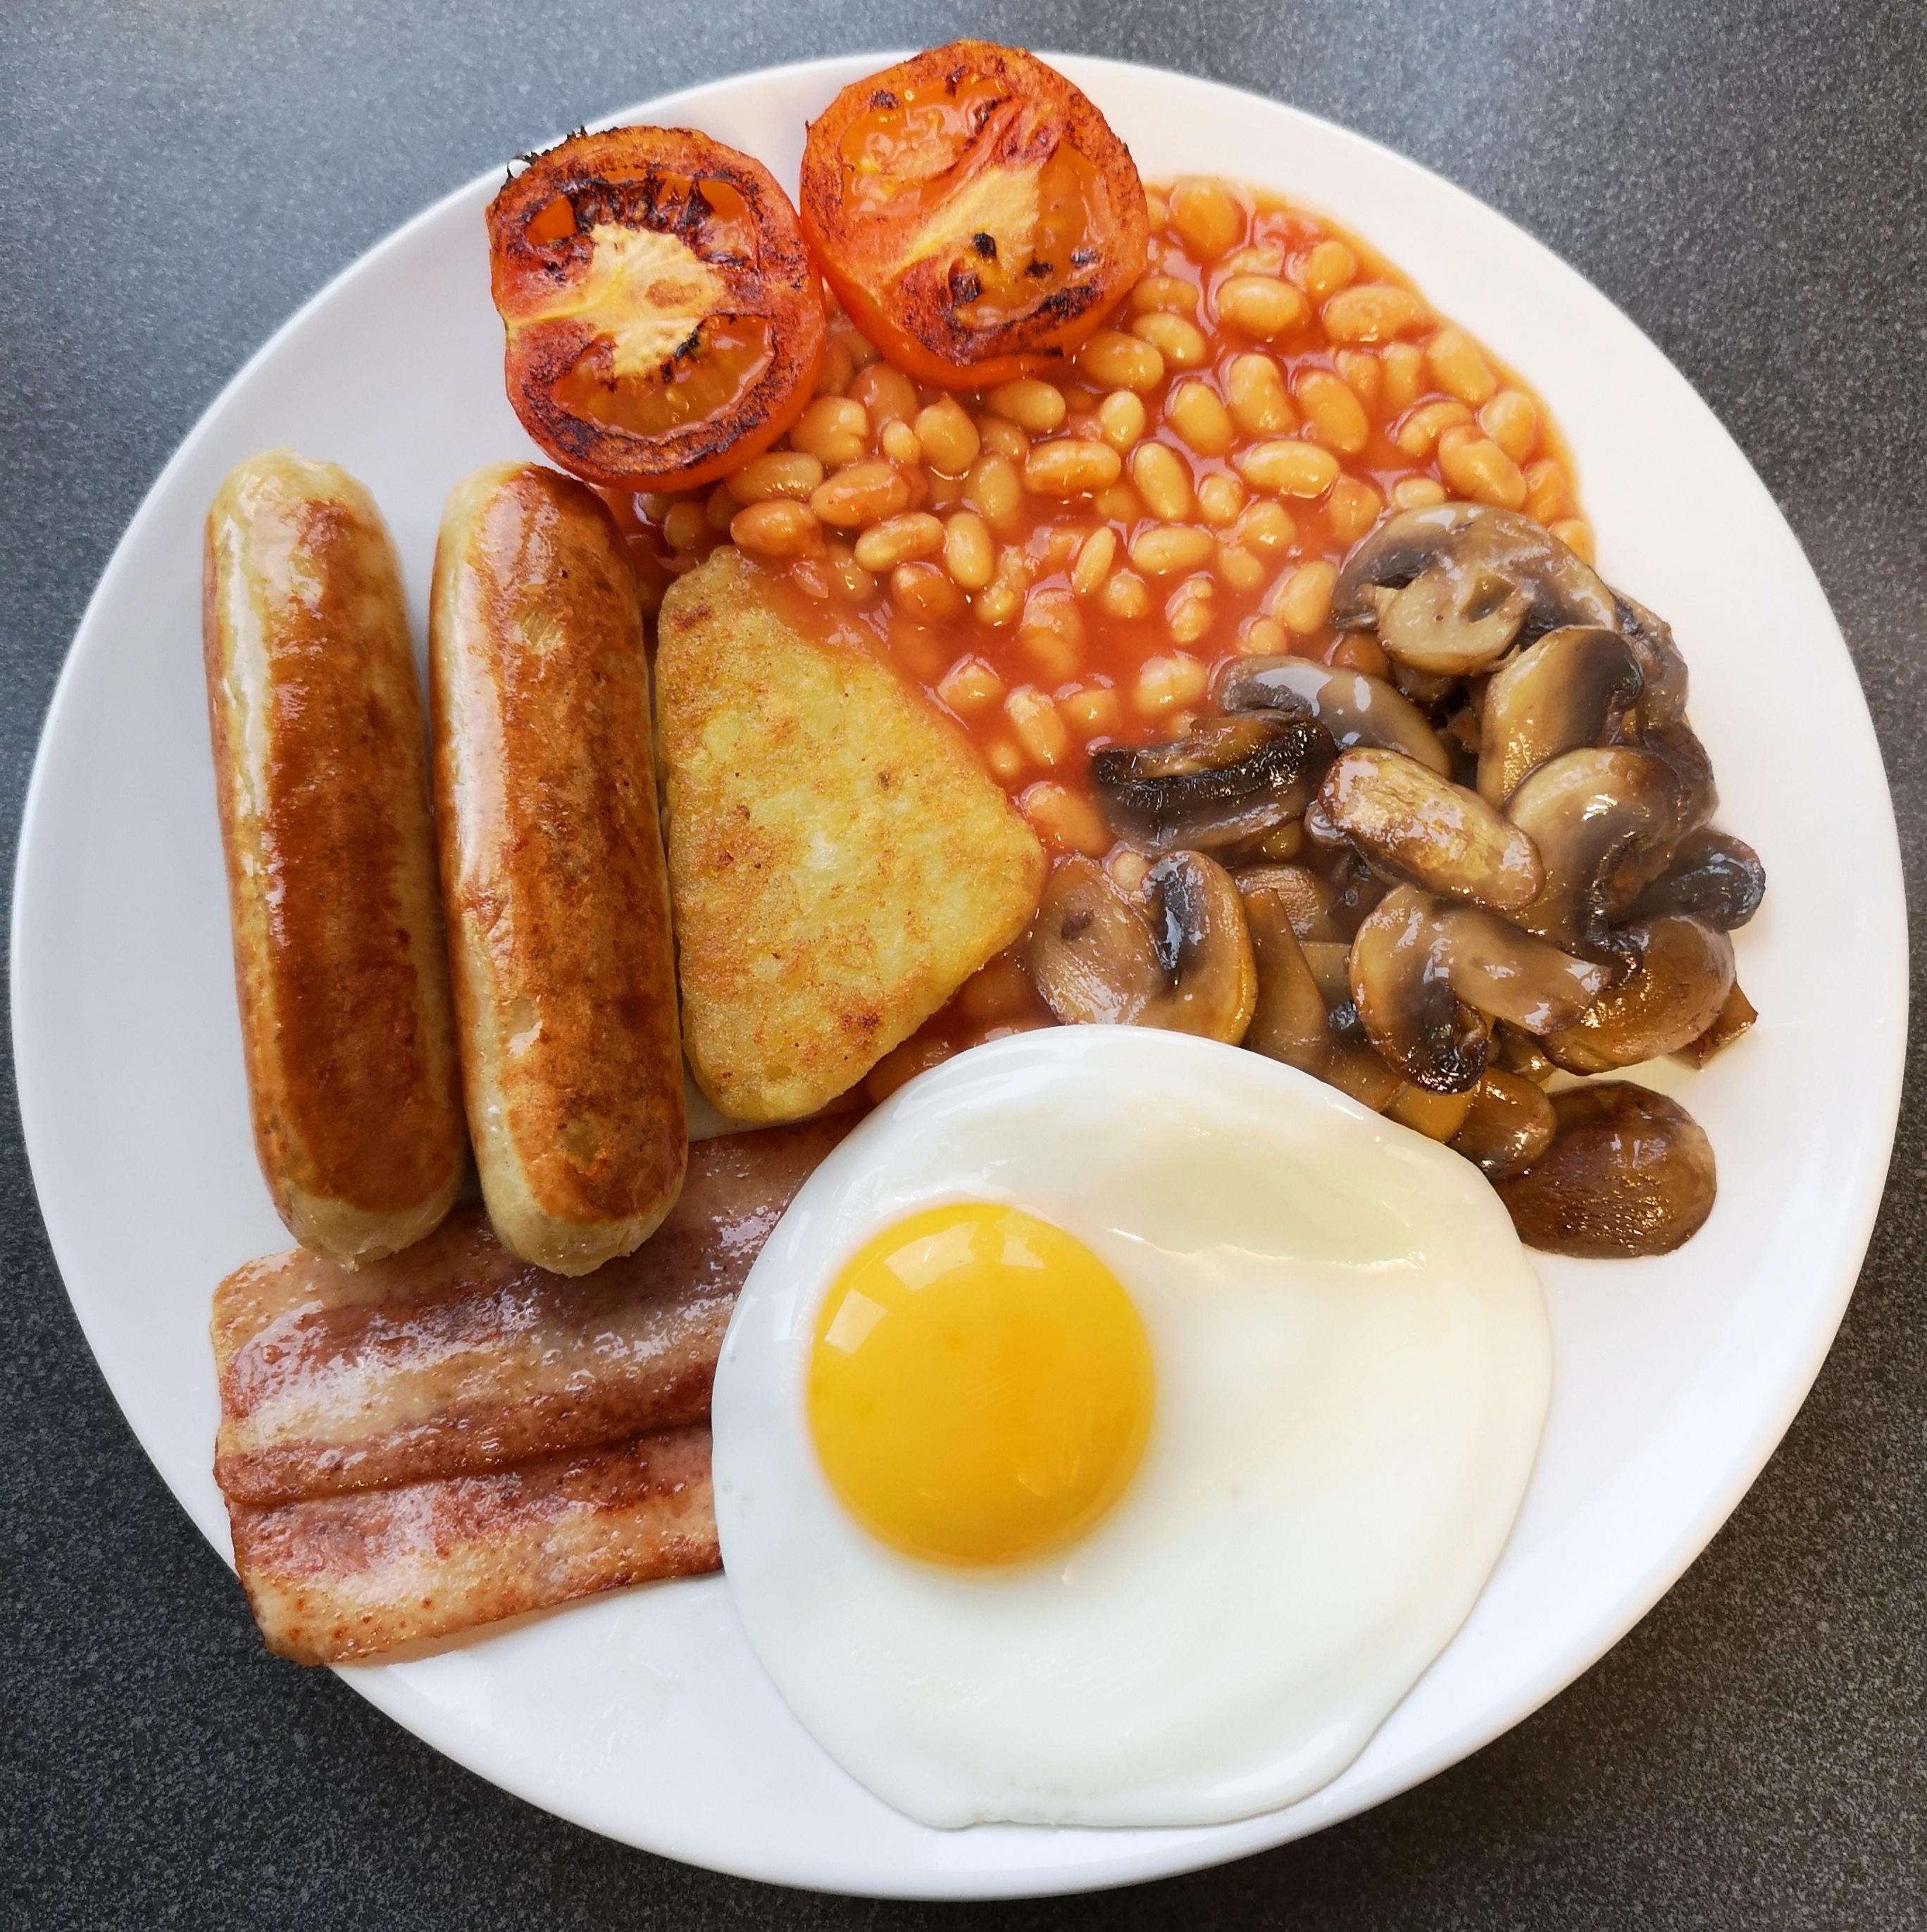 English breakfast - sunny side egg